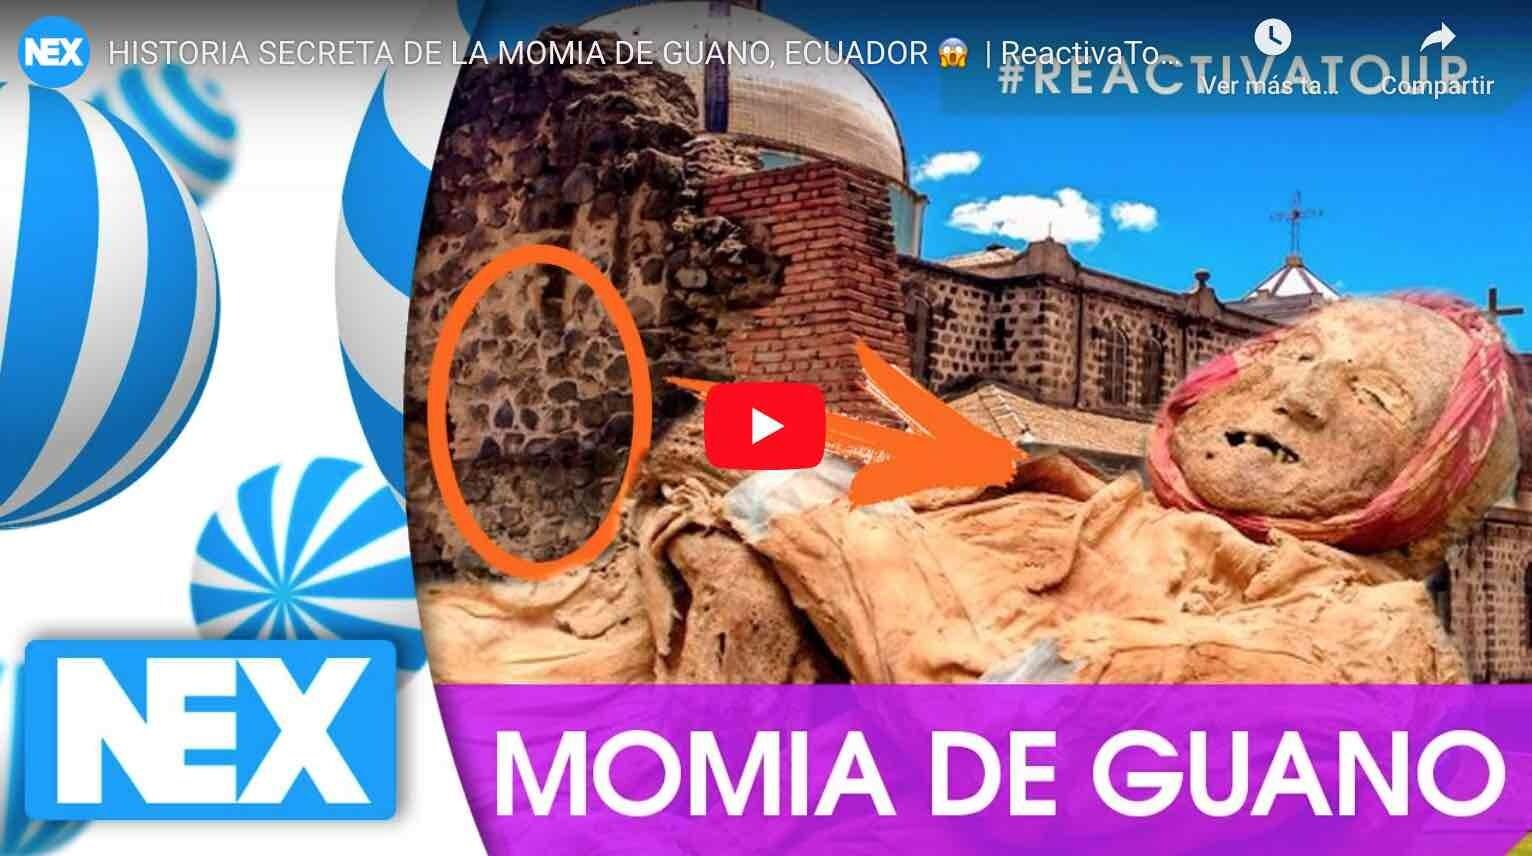 VIDEO: HISTORIA SECRETA DE LA MOMIA DE GUANO